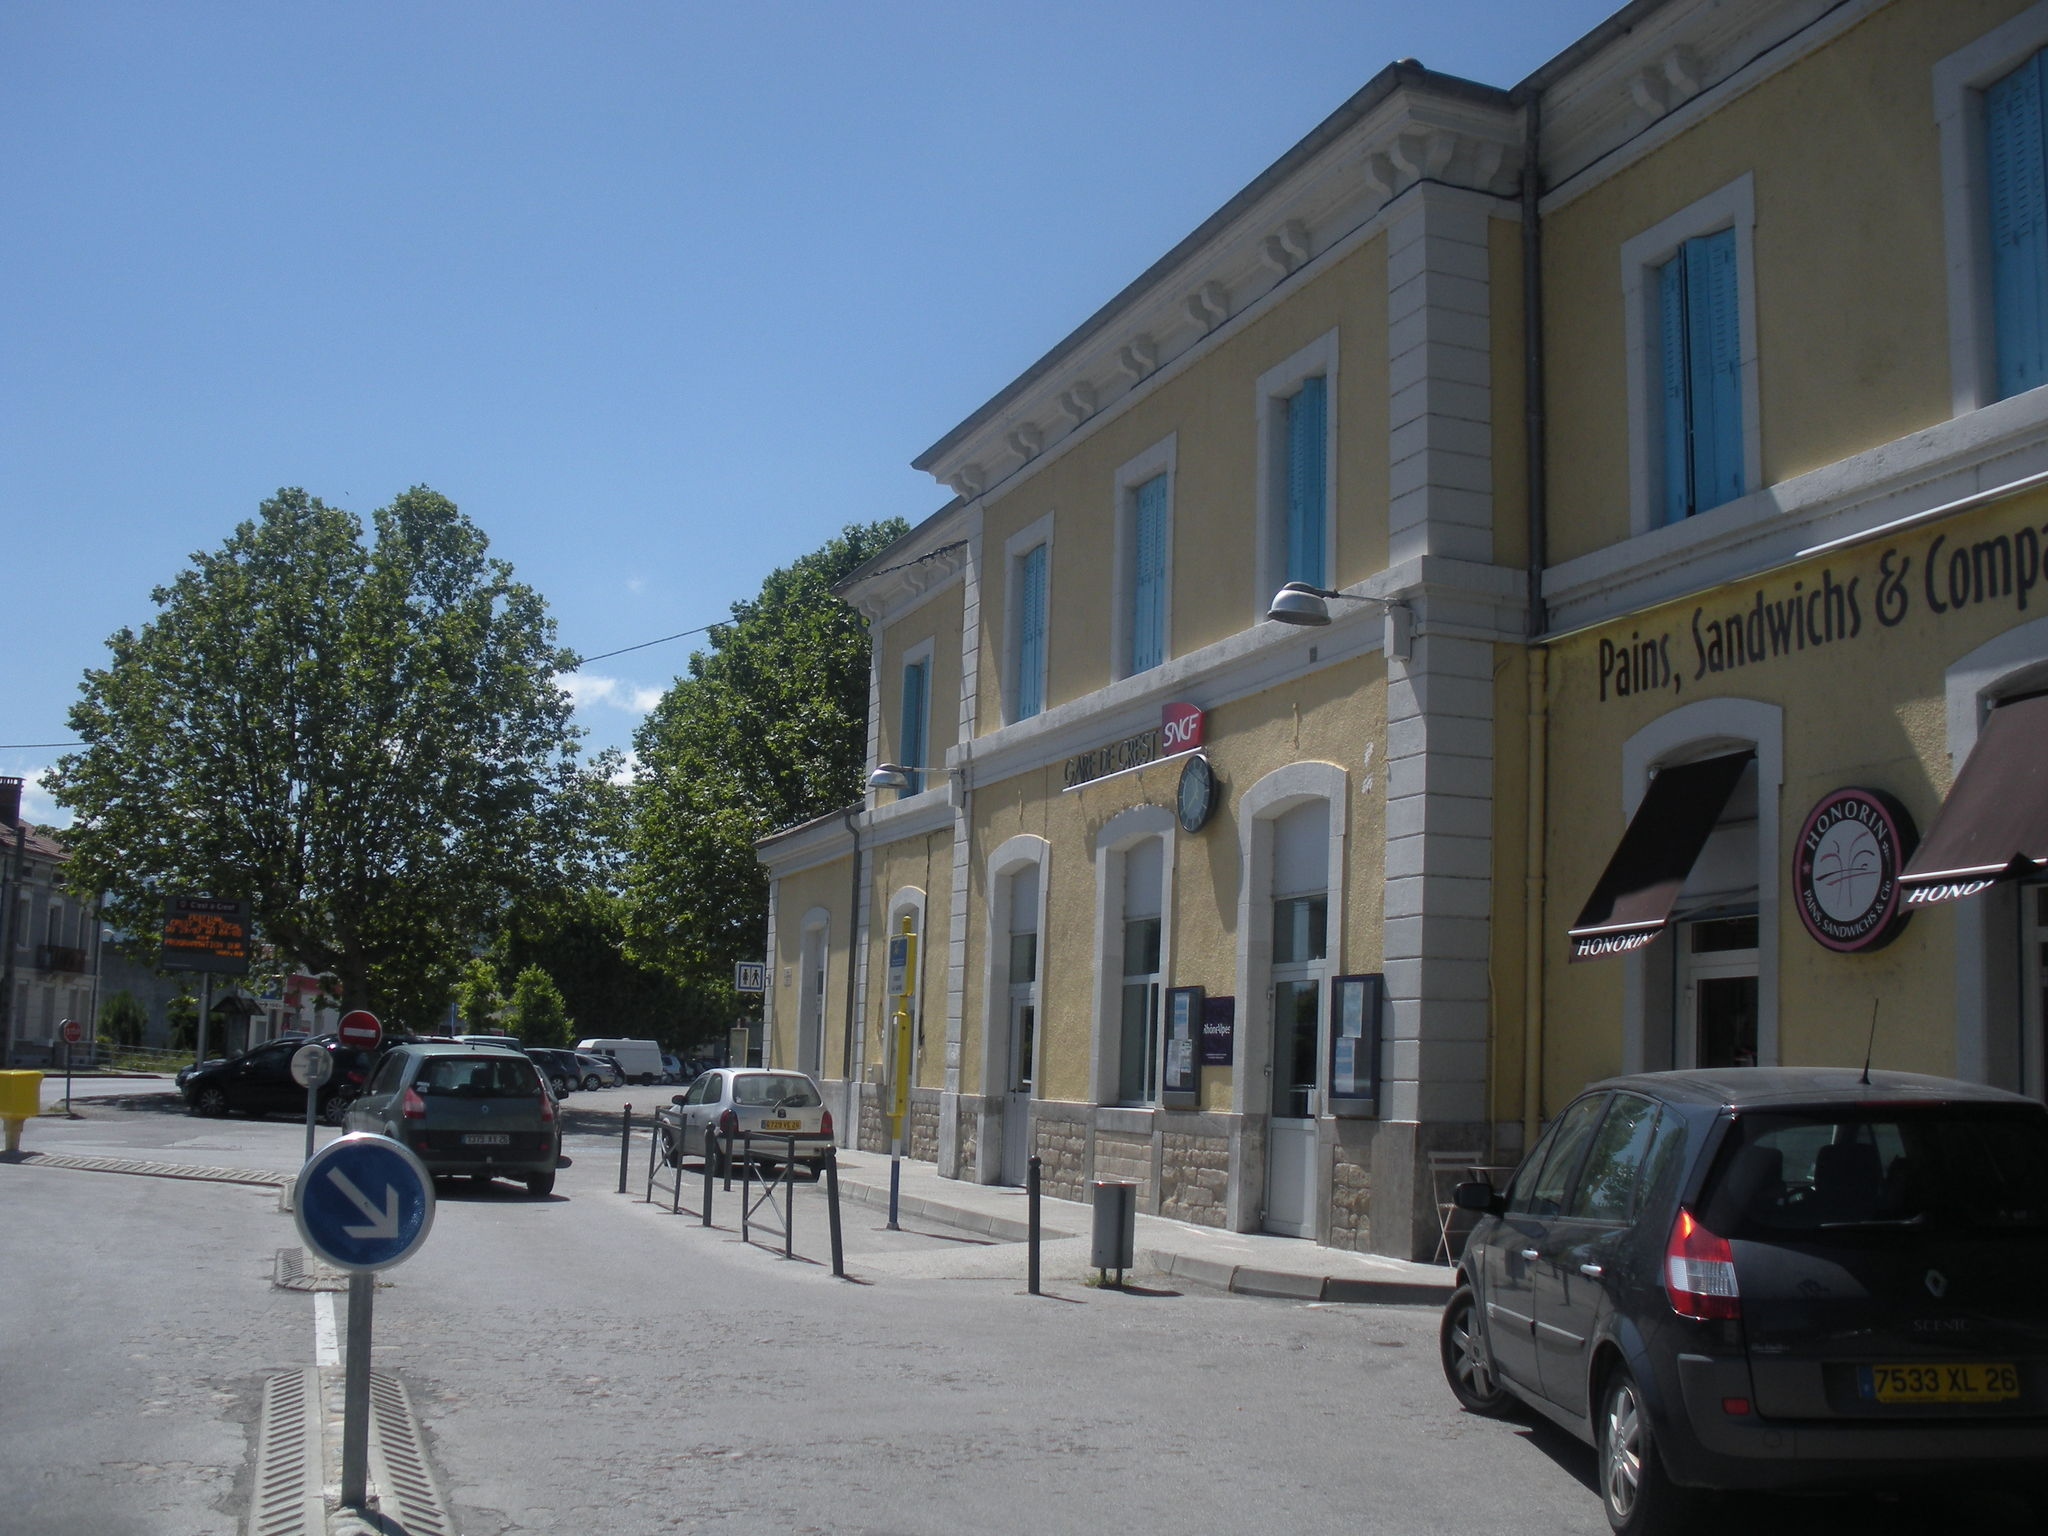 Crest (Drôme)